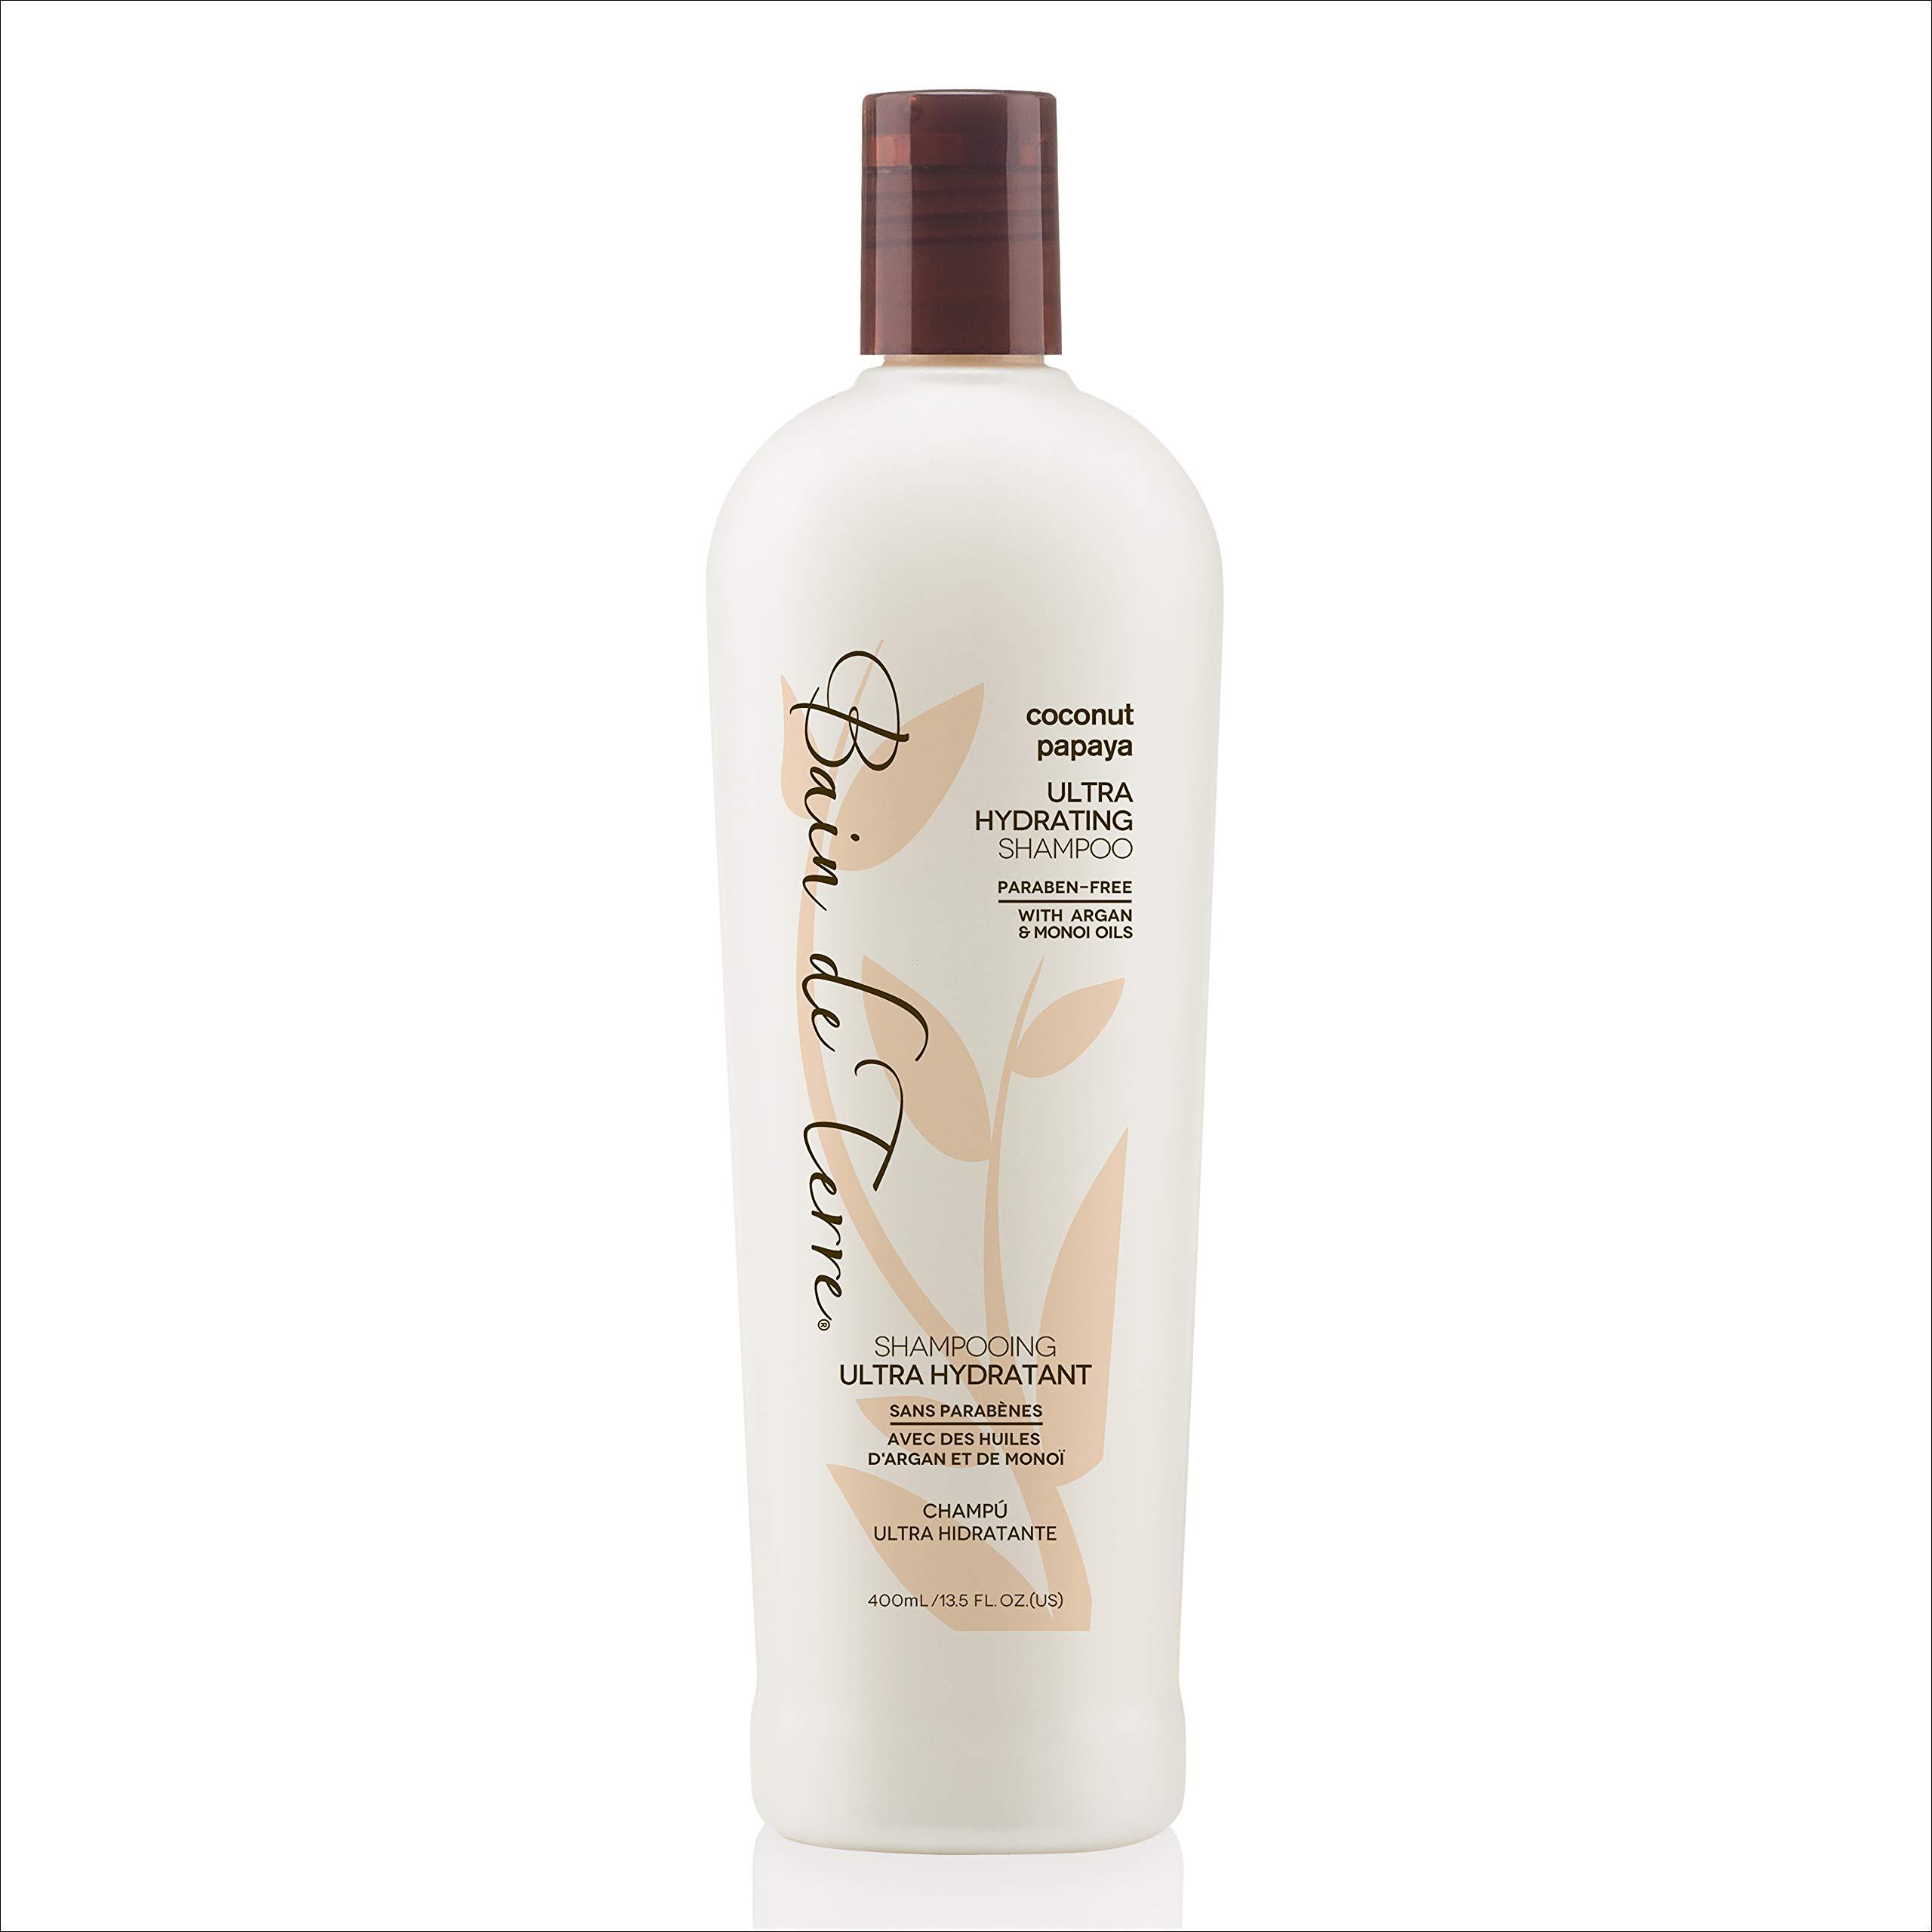 Bain de Terre Coconut Papaya Ultra Hydrating Shampoo, with Argan and Monoi Oil, Paraben-Free, 13.5-Ounce